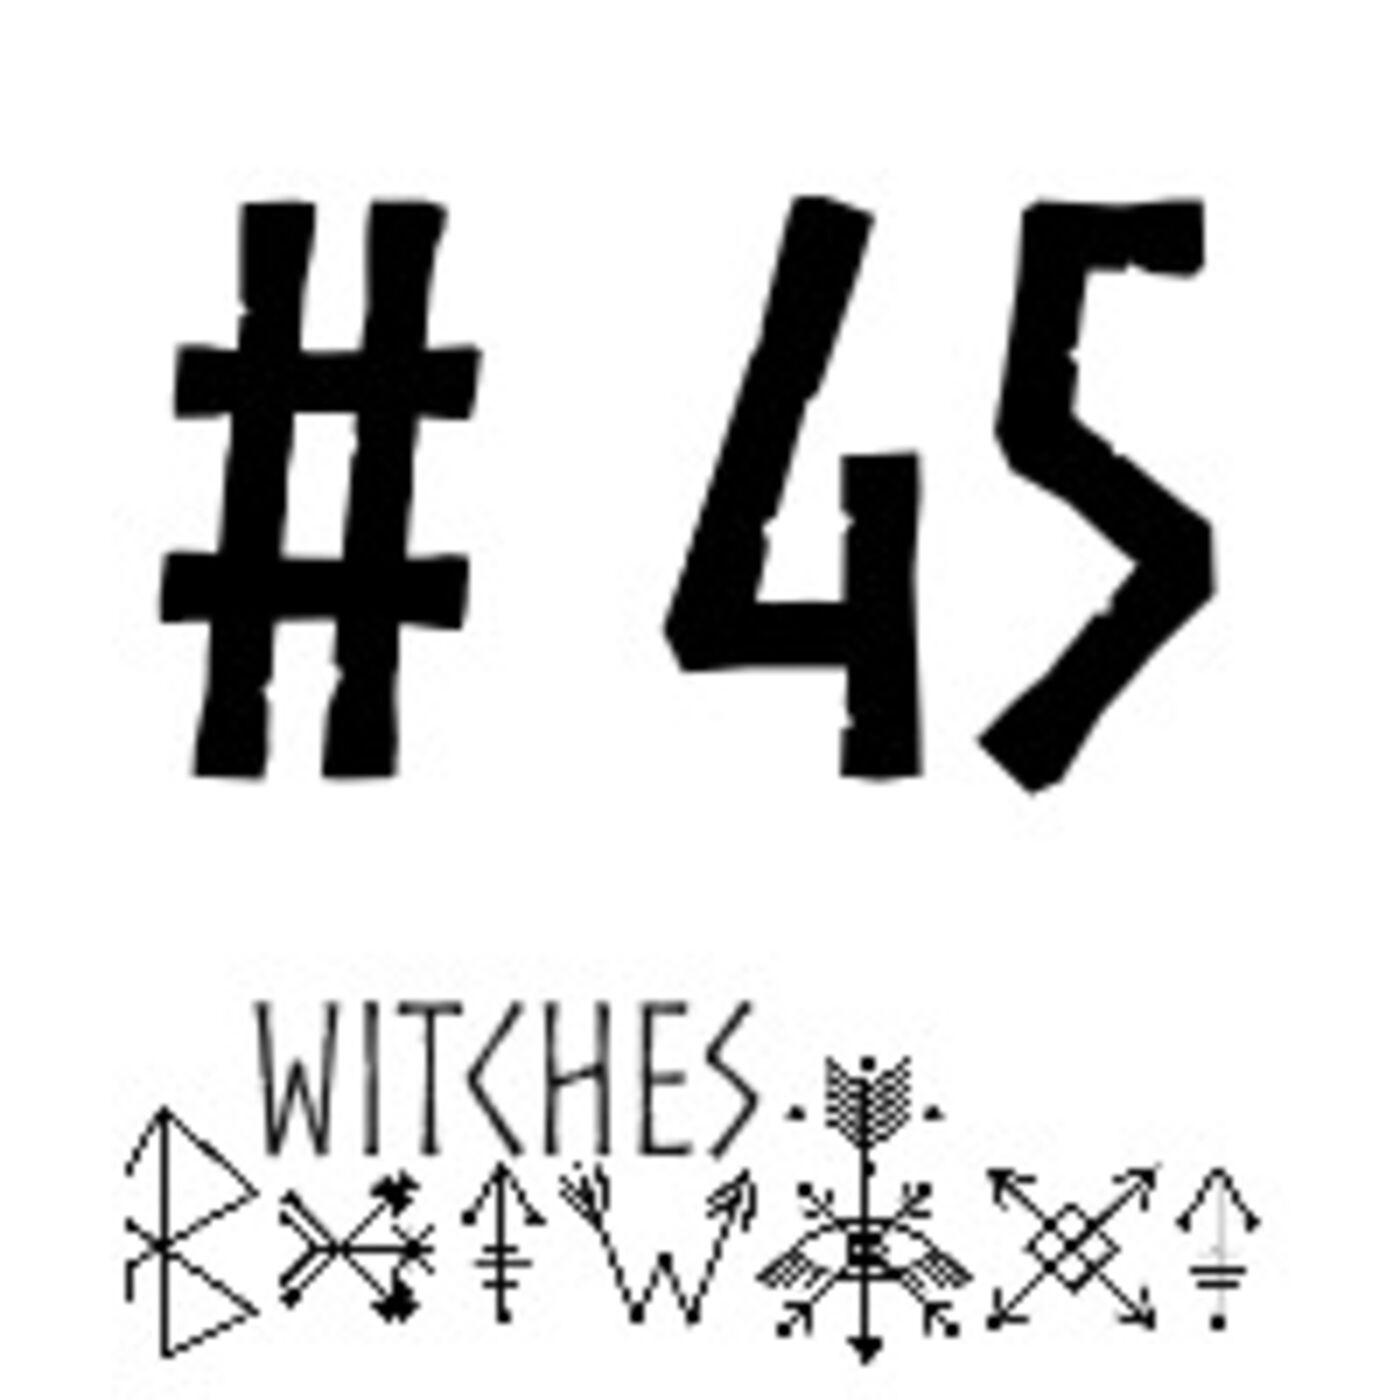 WBTEXT EP #45 - Drugs aren't always bad, mmkay?